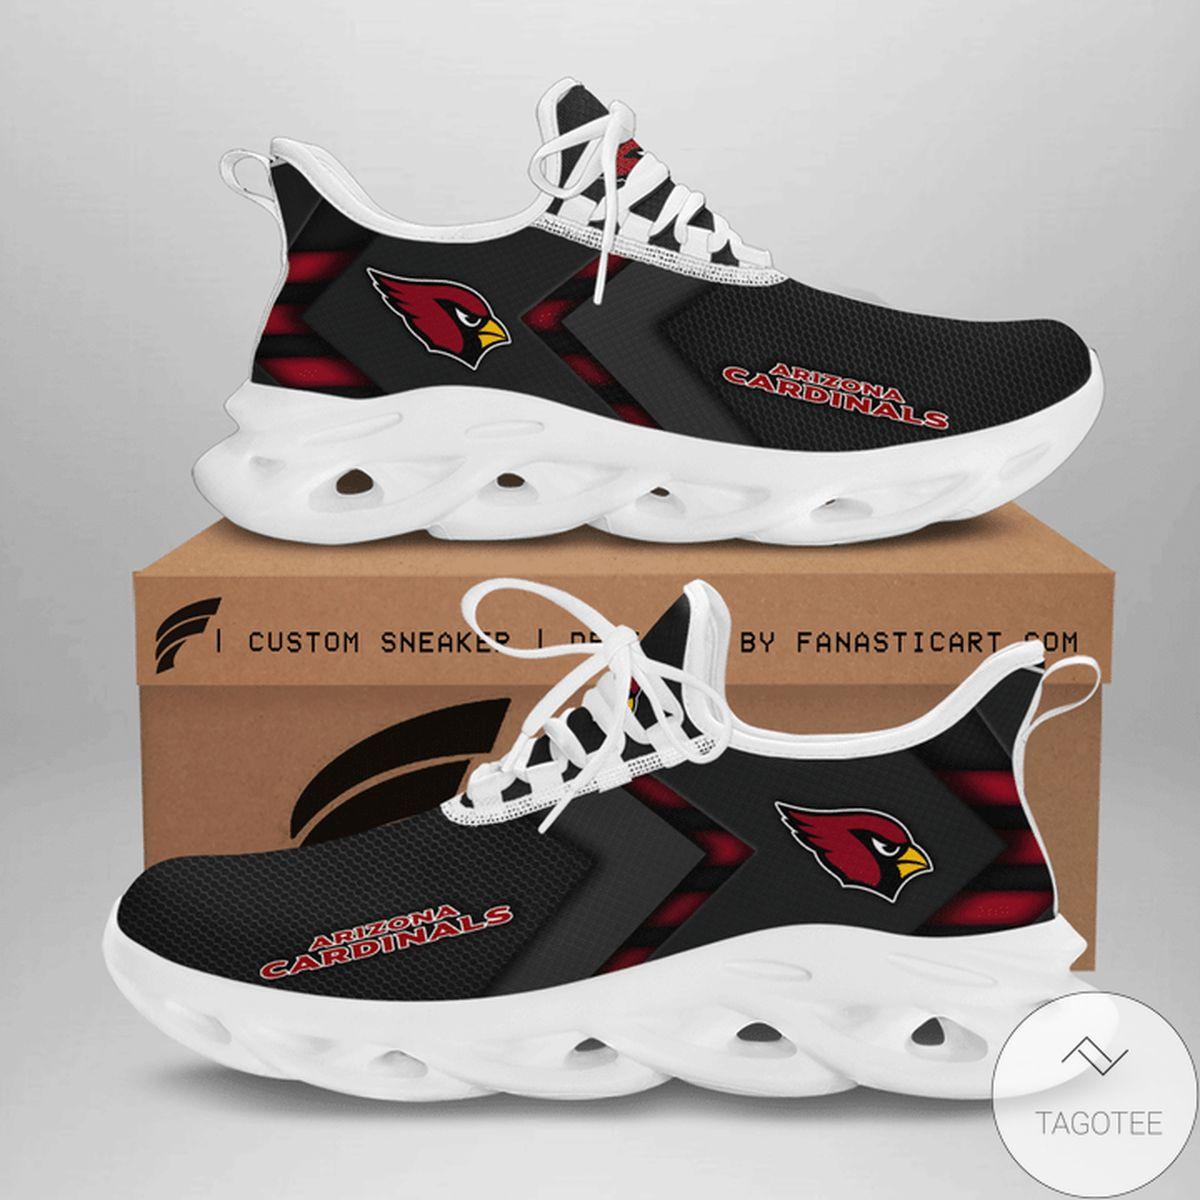 Drop Shipping Arizona Cardinal Max Soul Shoes